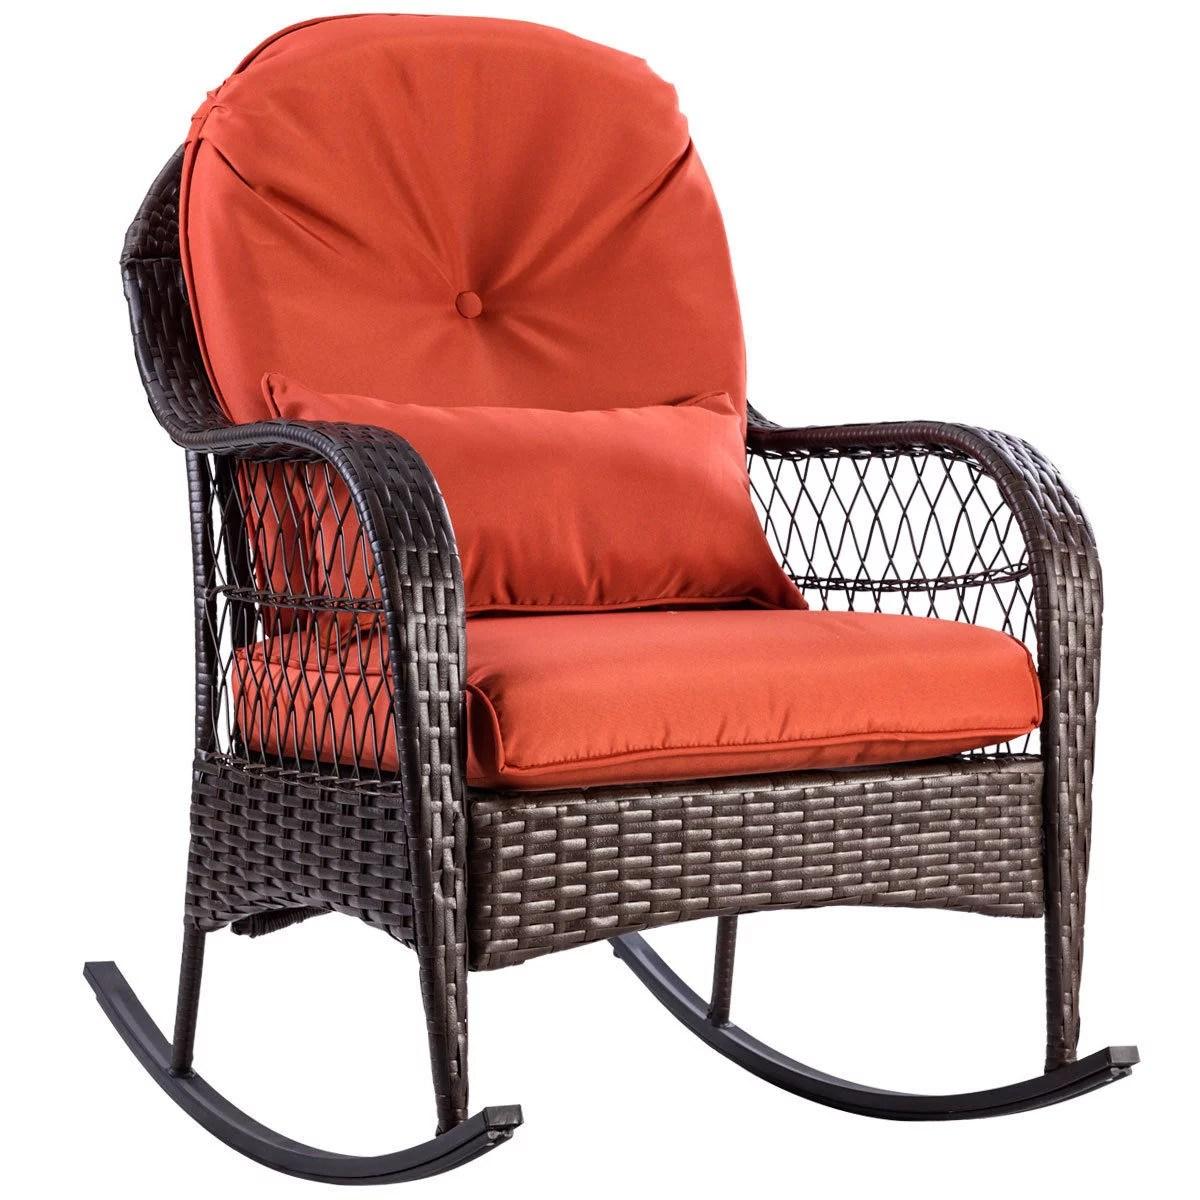 walmart outdoor rocking chair swinton avenue trading gymax patio rattan wicker porch deck rocker